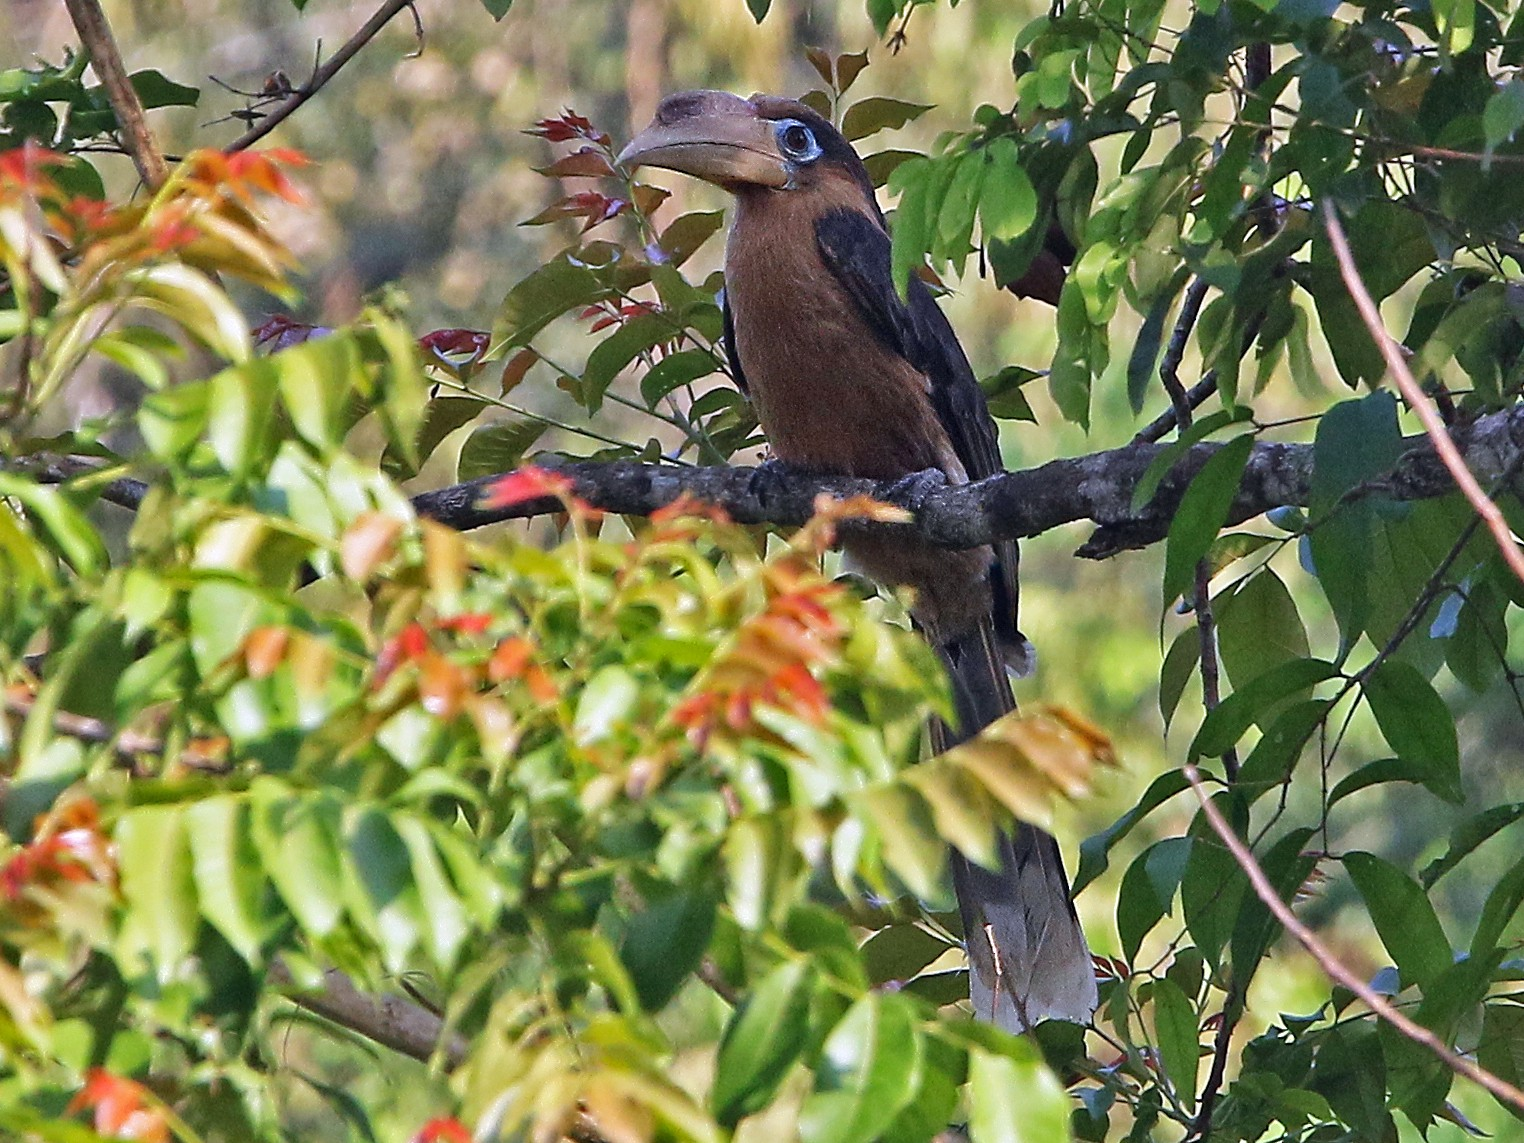 Rusty-cheeked Hornbill - Christoph Moning